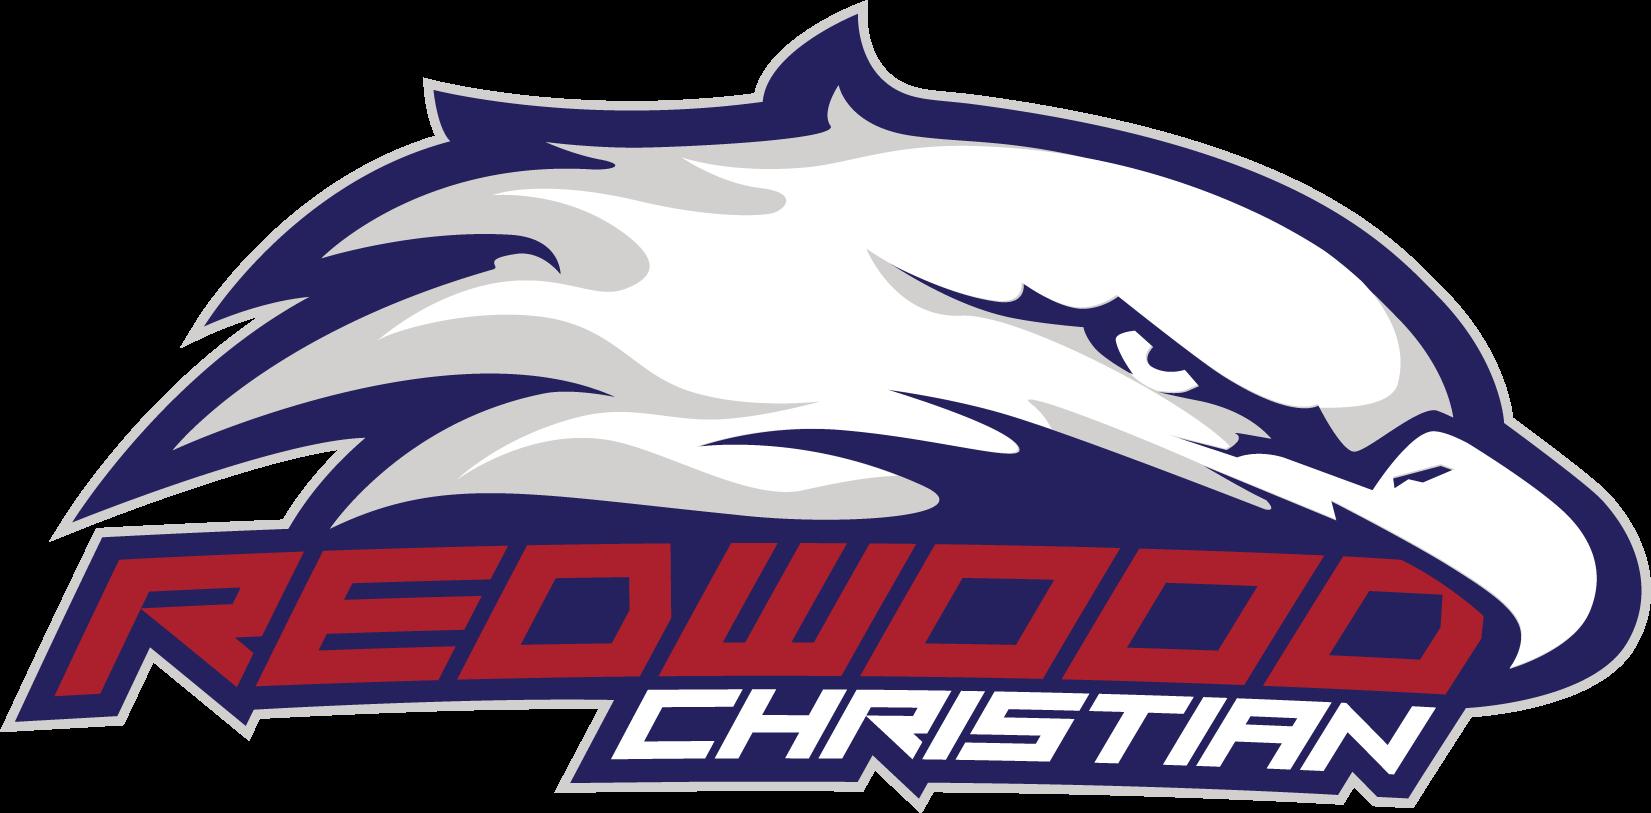 Redwood Christian Schools - Redwood Christian Elementary School